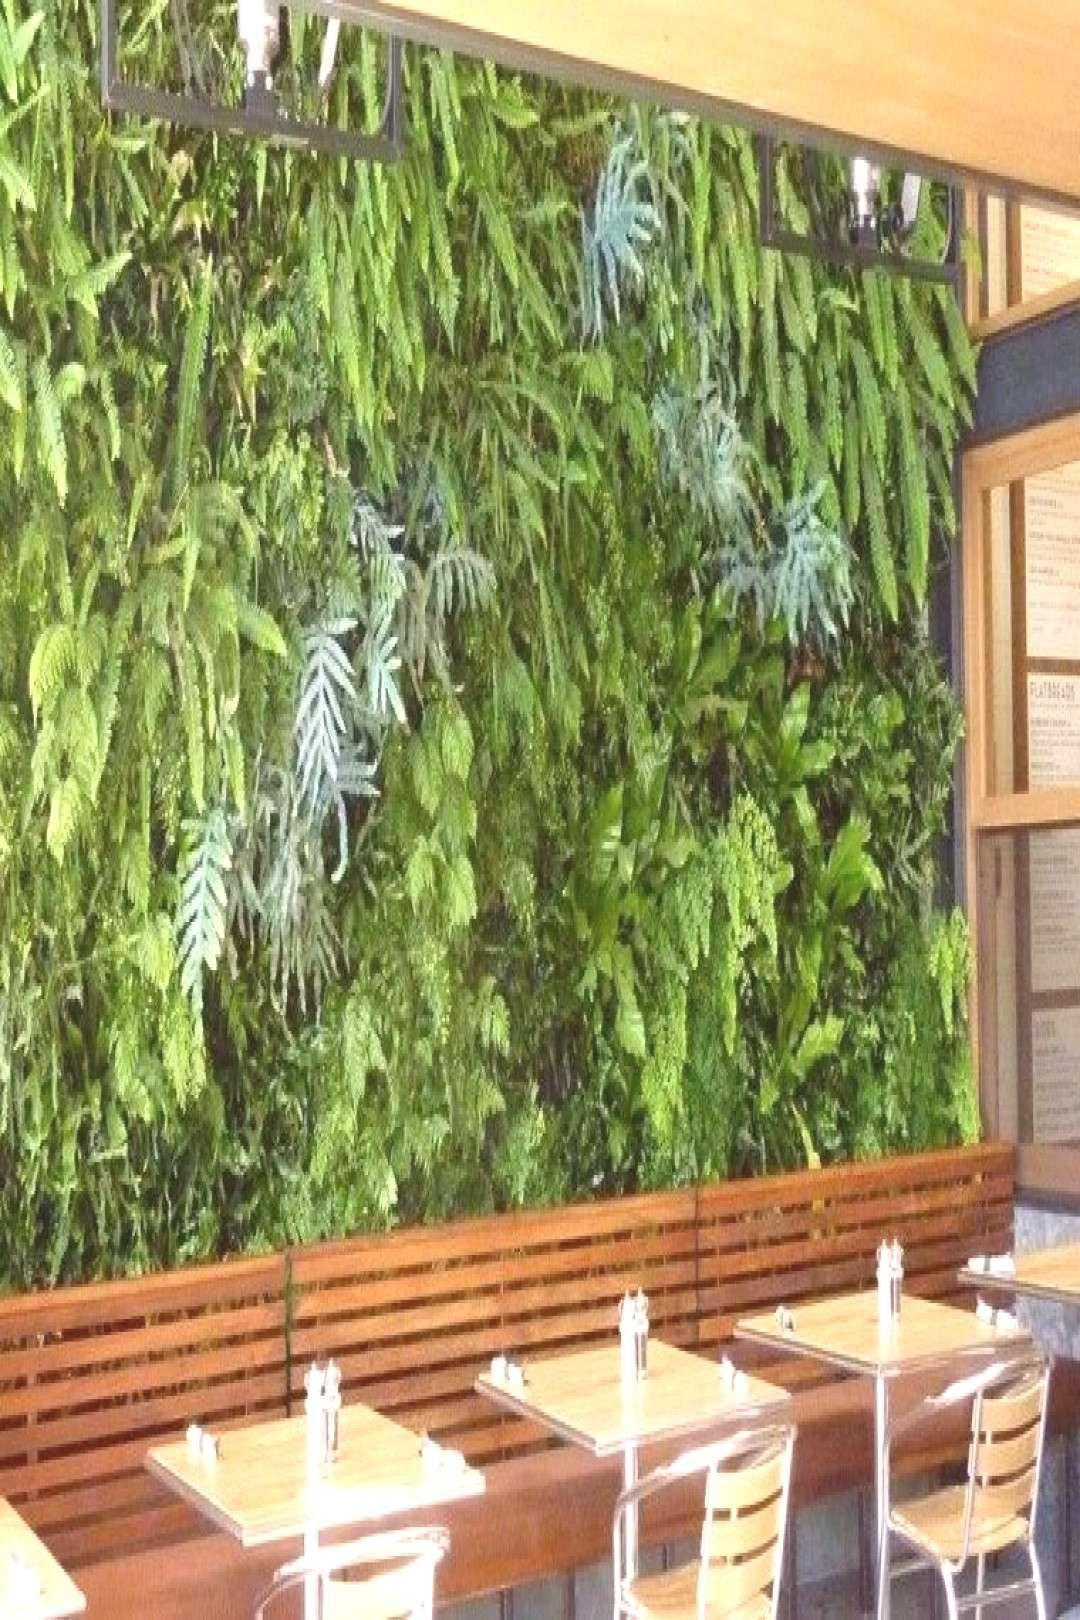 #restaurante #attribution #emplacement #domestiques #nonobstant #natu...